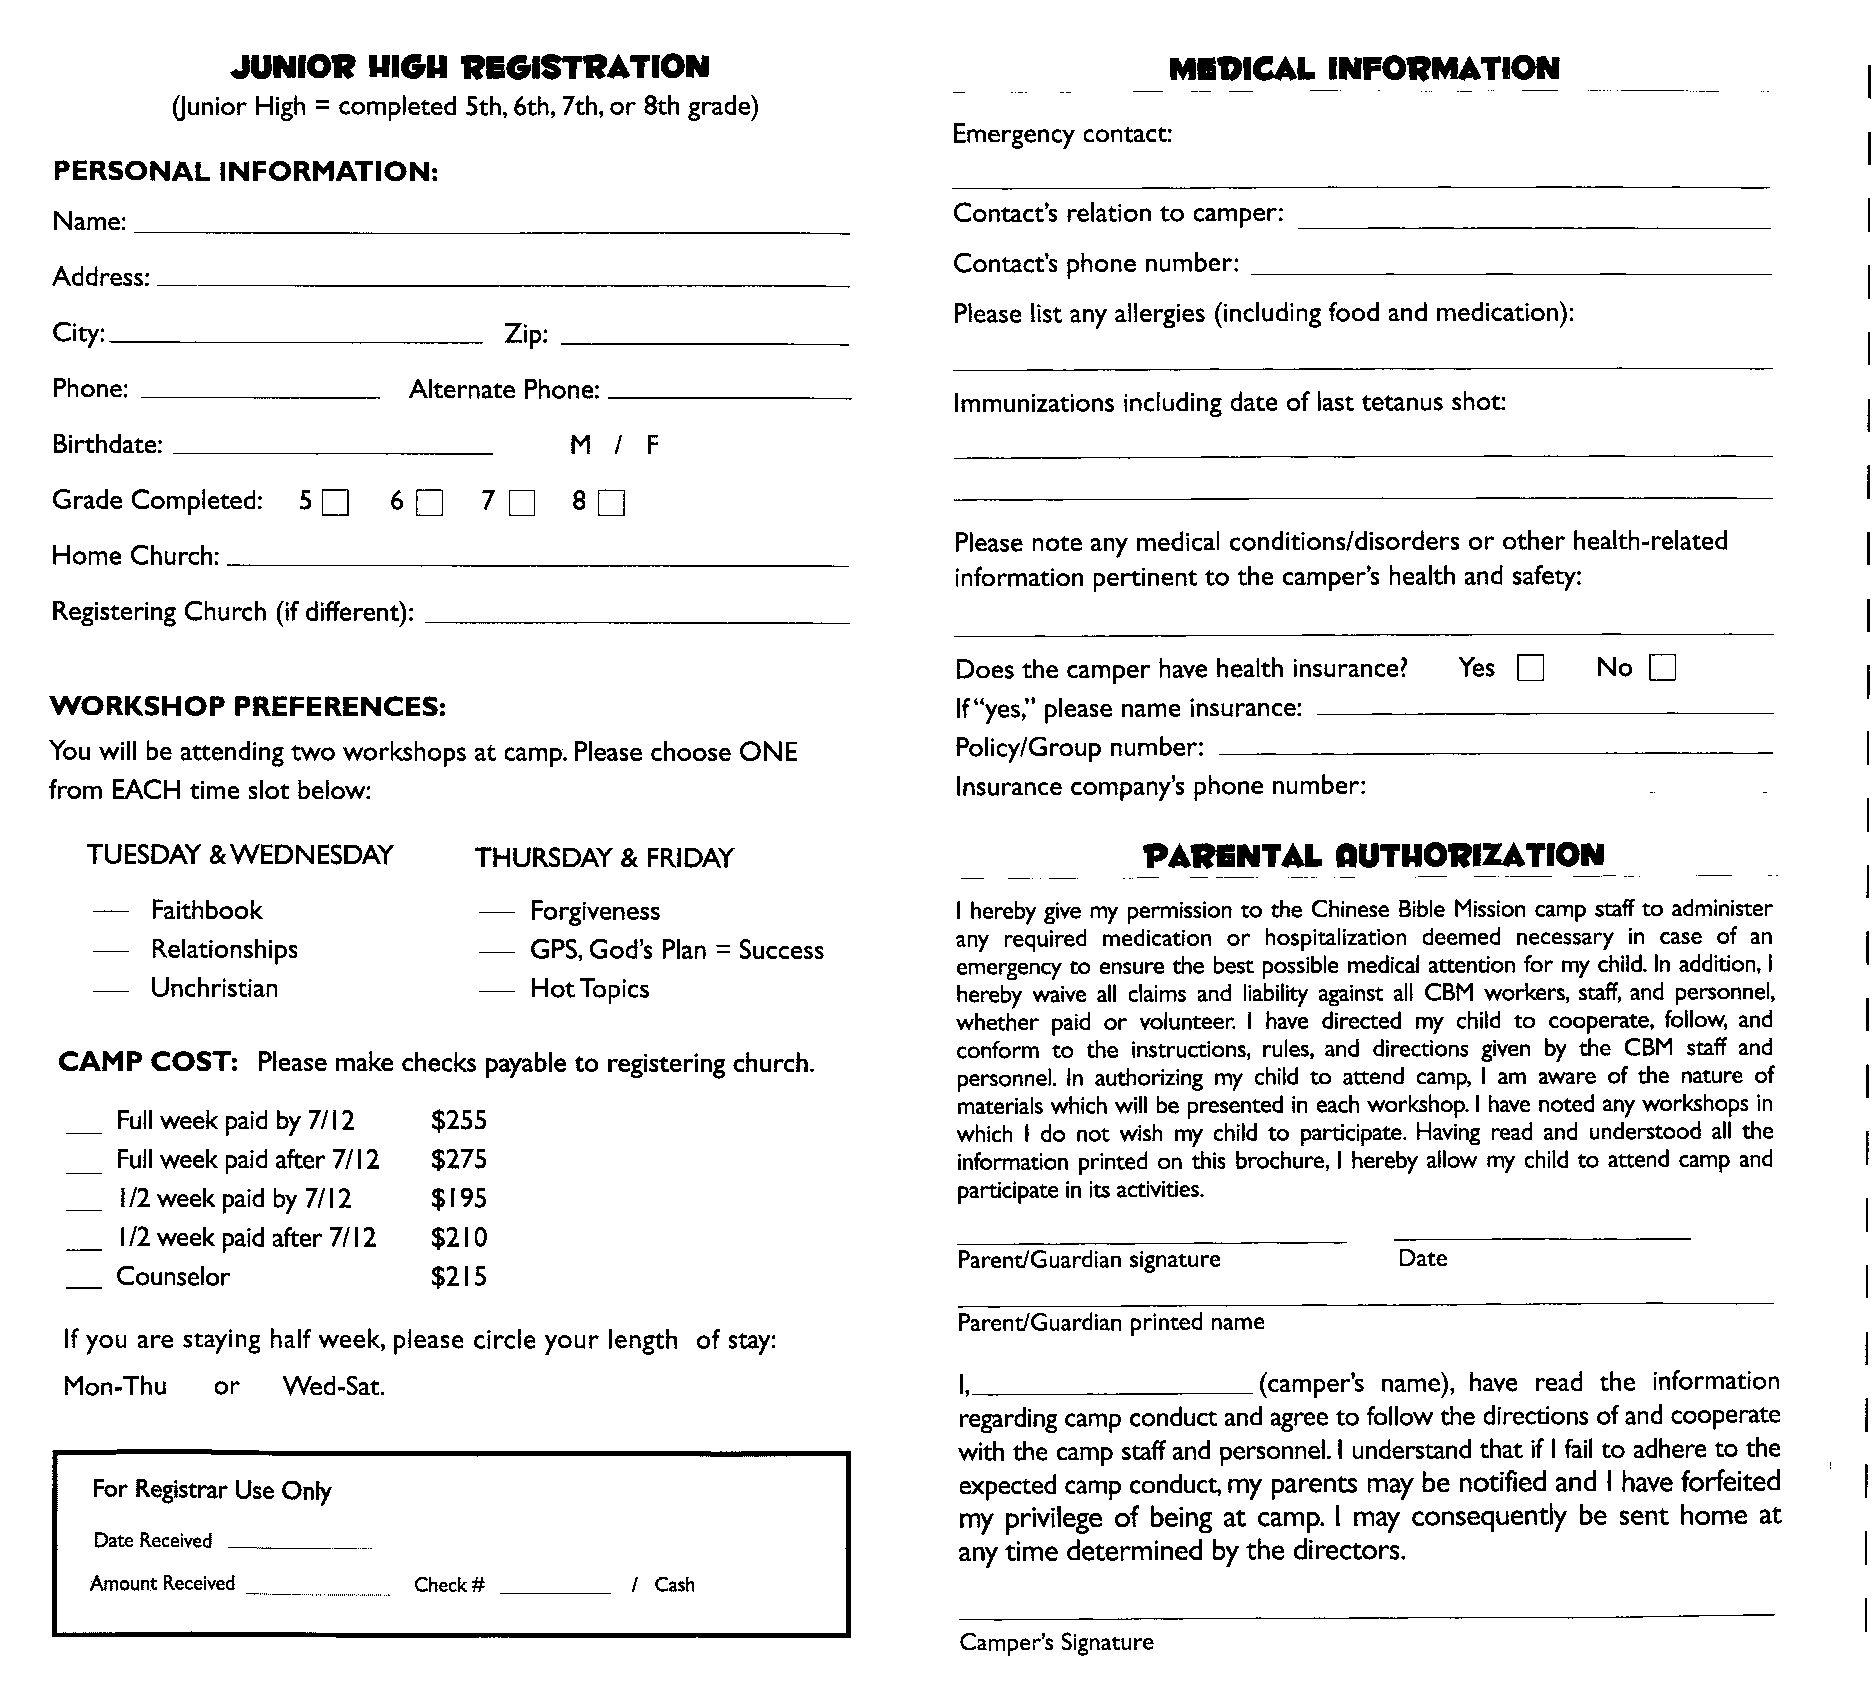 youth conference registration form template images template design ideas. Black Bedroom Furniture Sets. Home Design Ideas